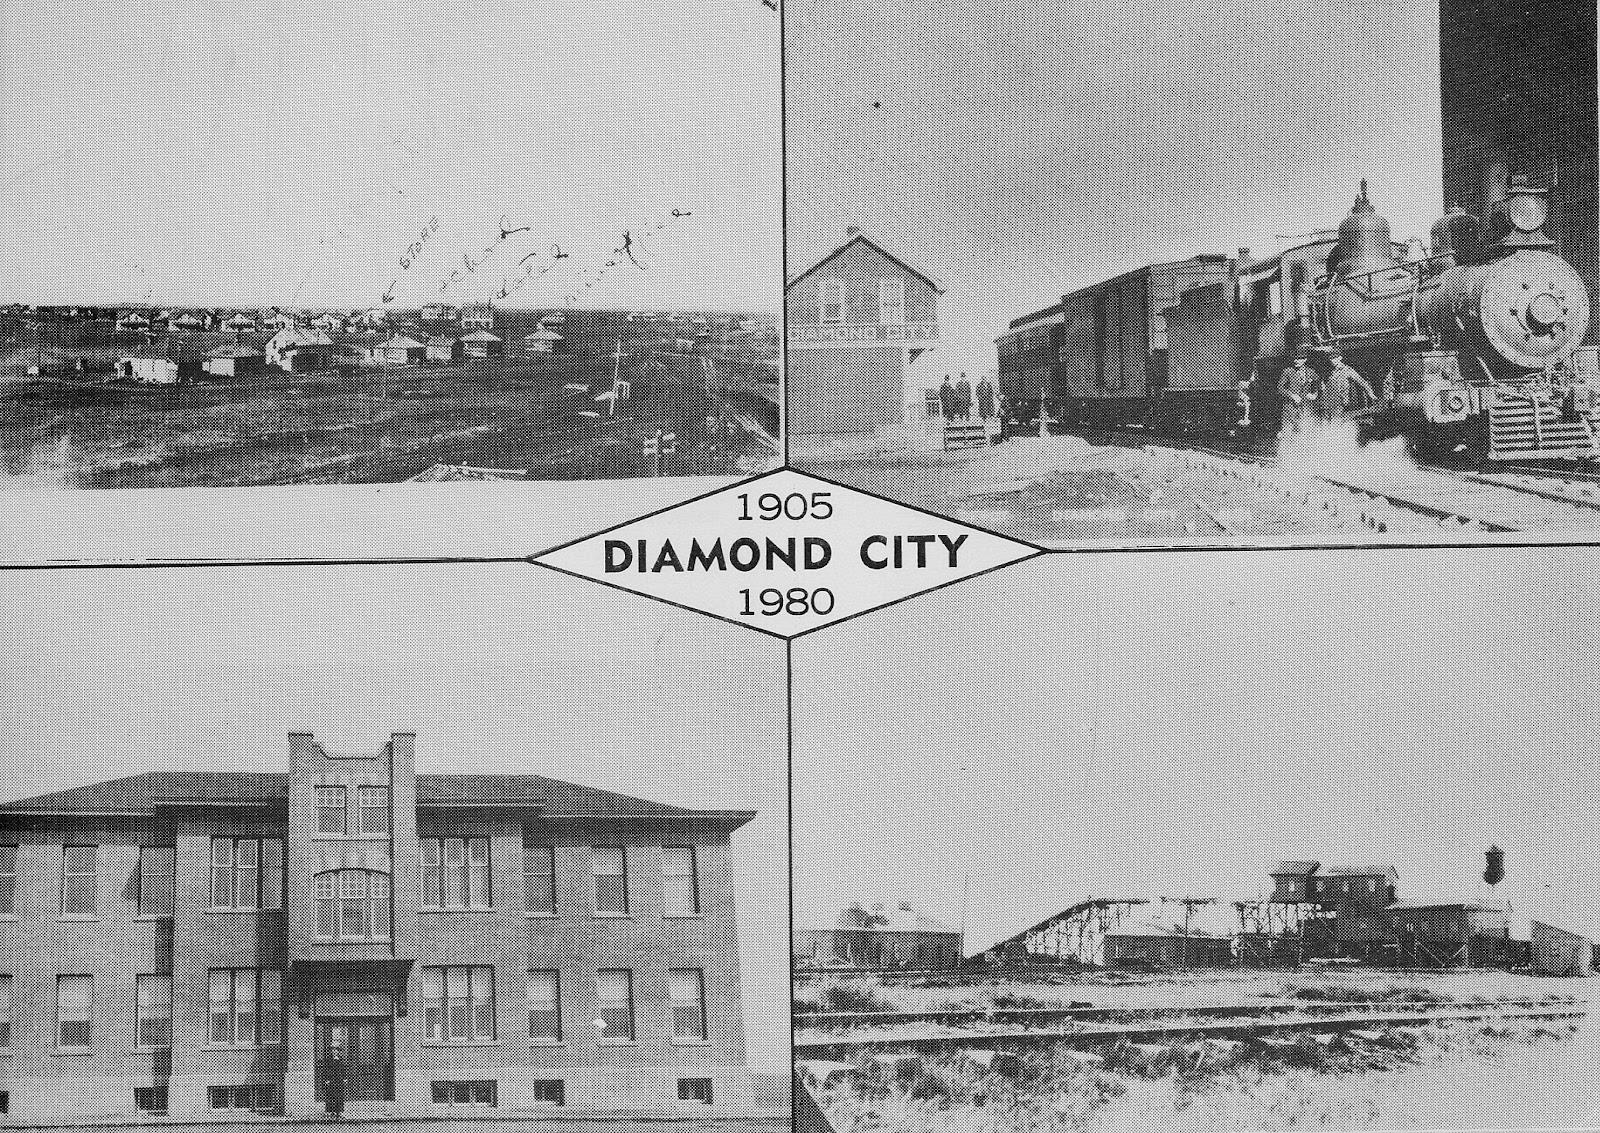 Diamond City, 1905-1980 postcard.    Courtesy the Galt Museum & Archives: 19841061000